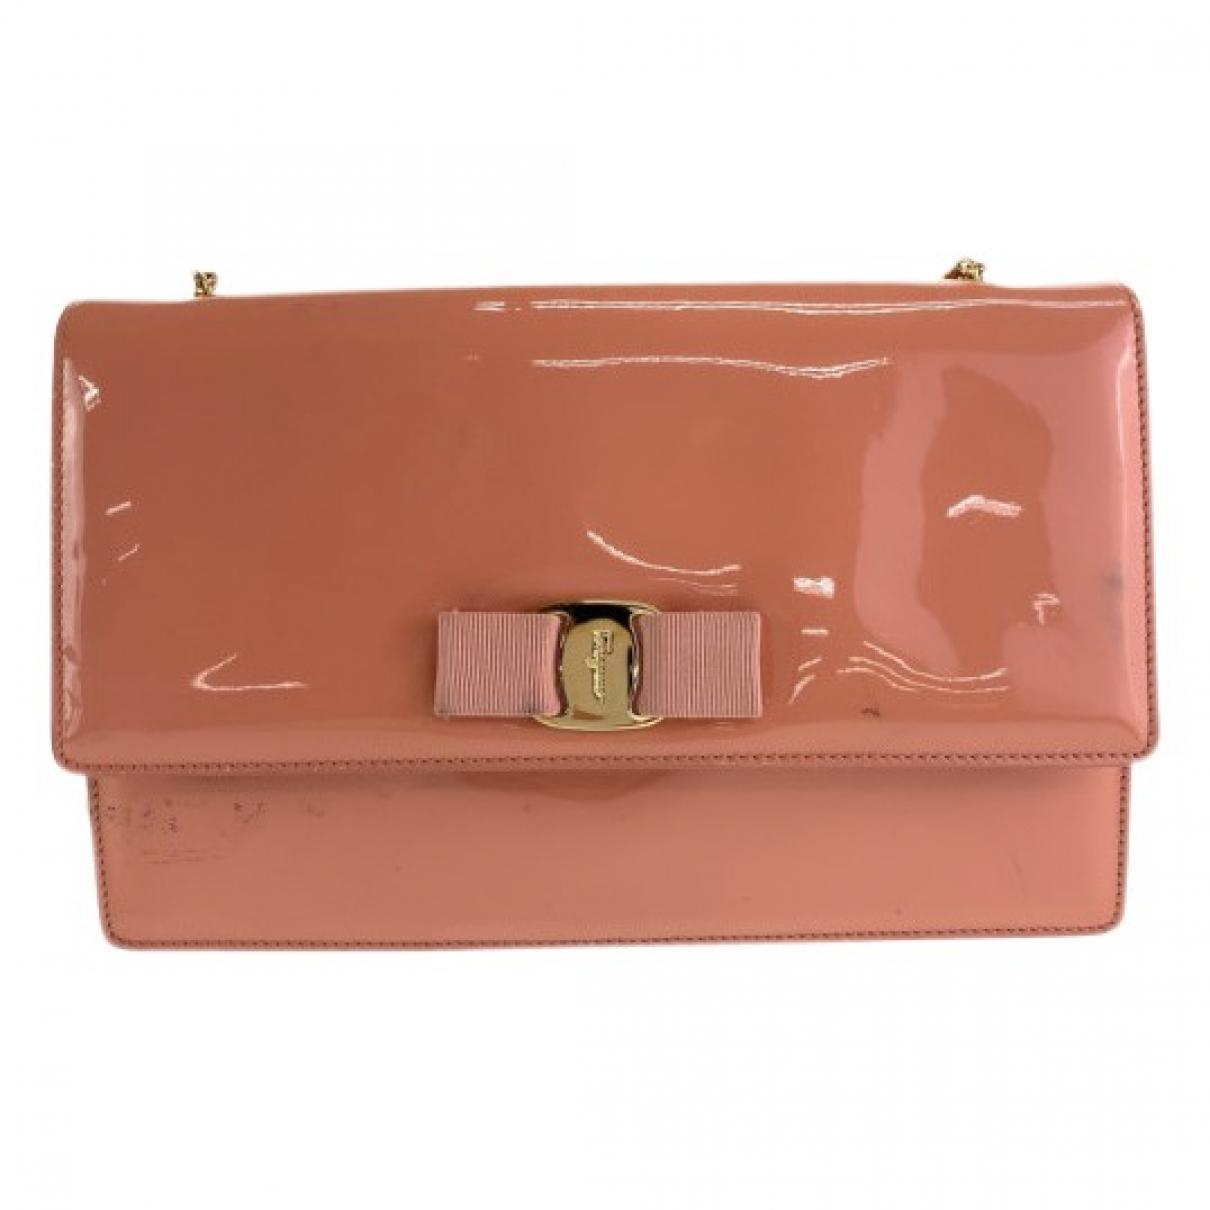 Salvatore Ferragamo \N Patent leather handbag for Women \N